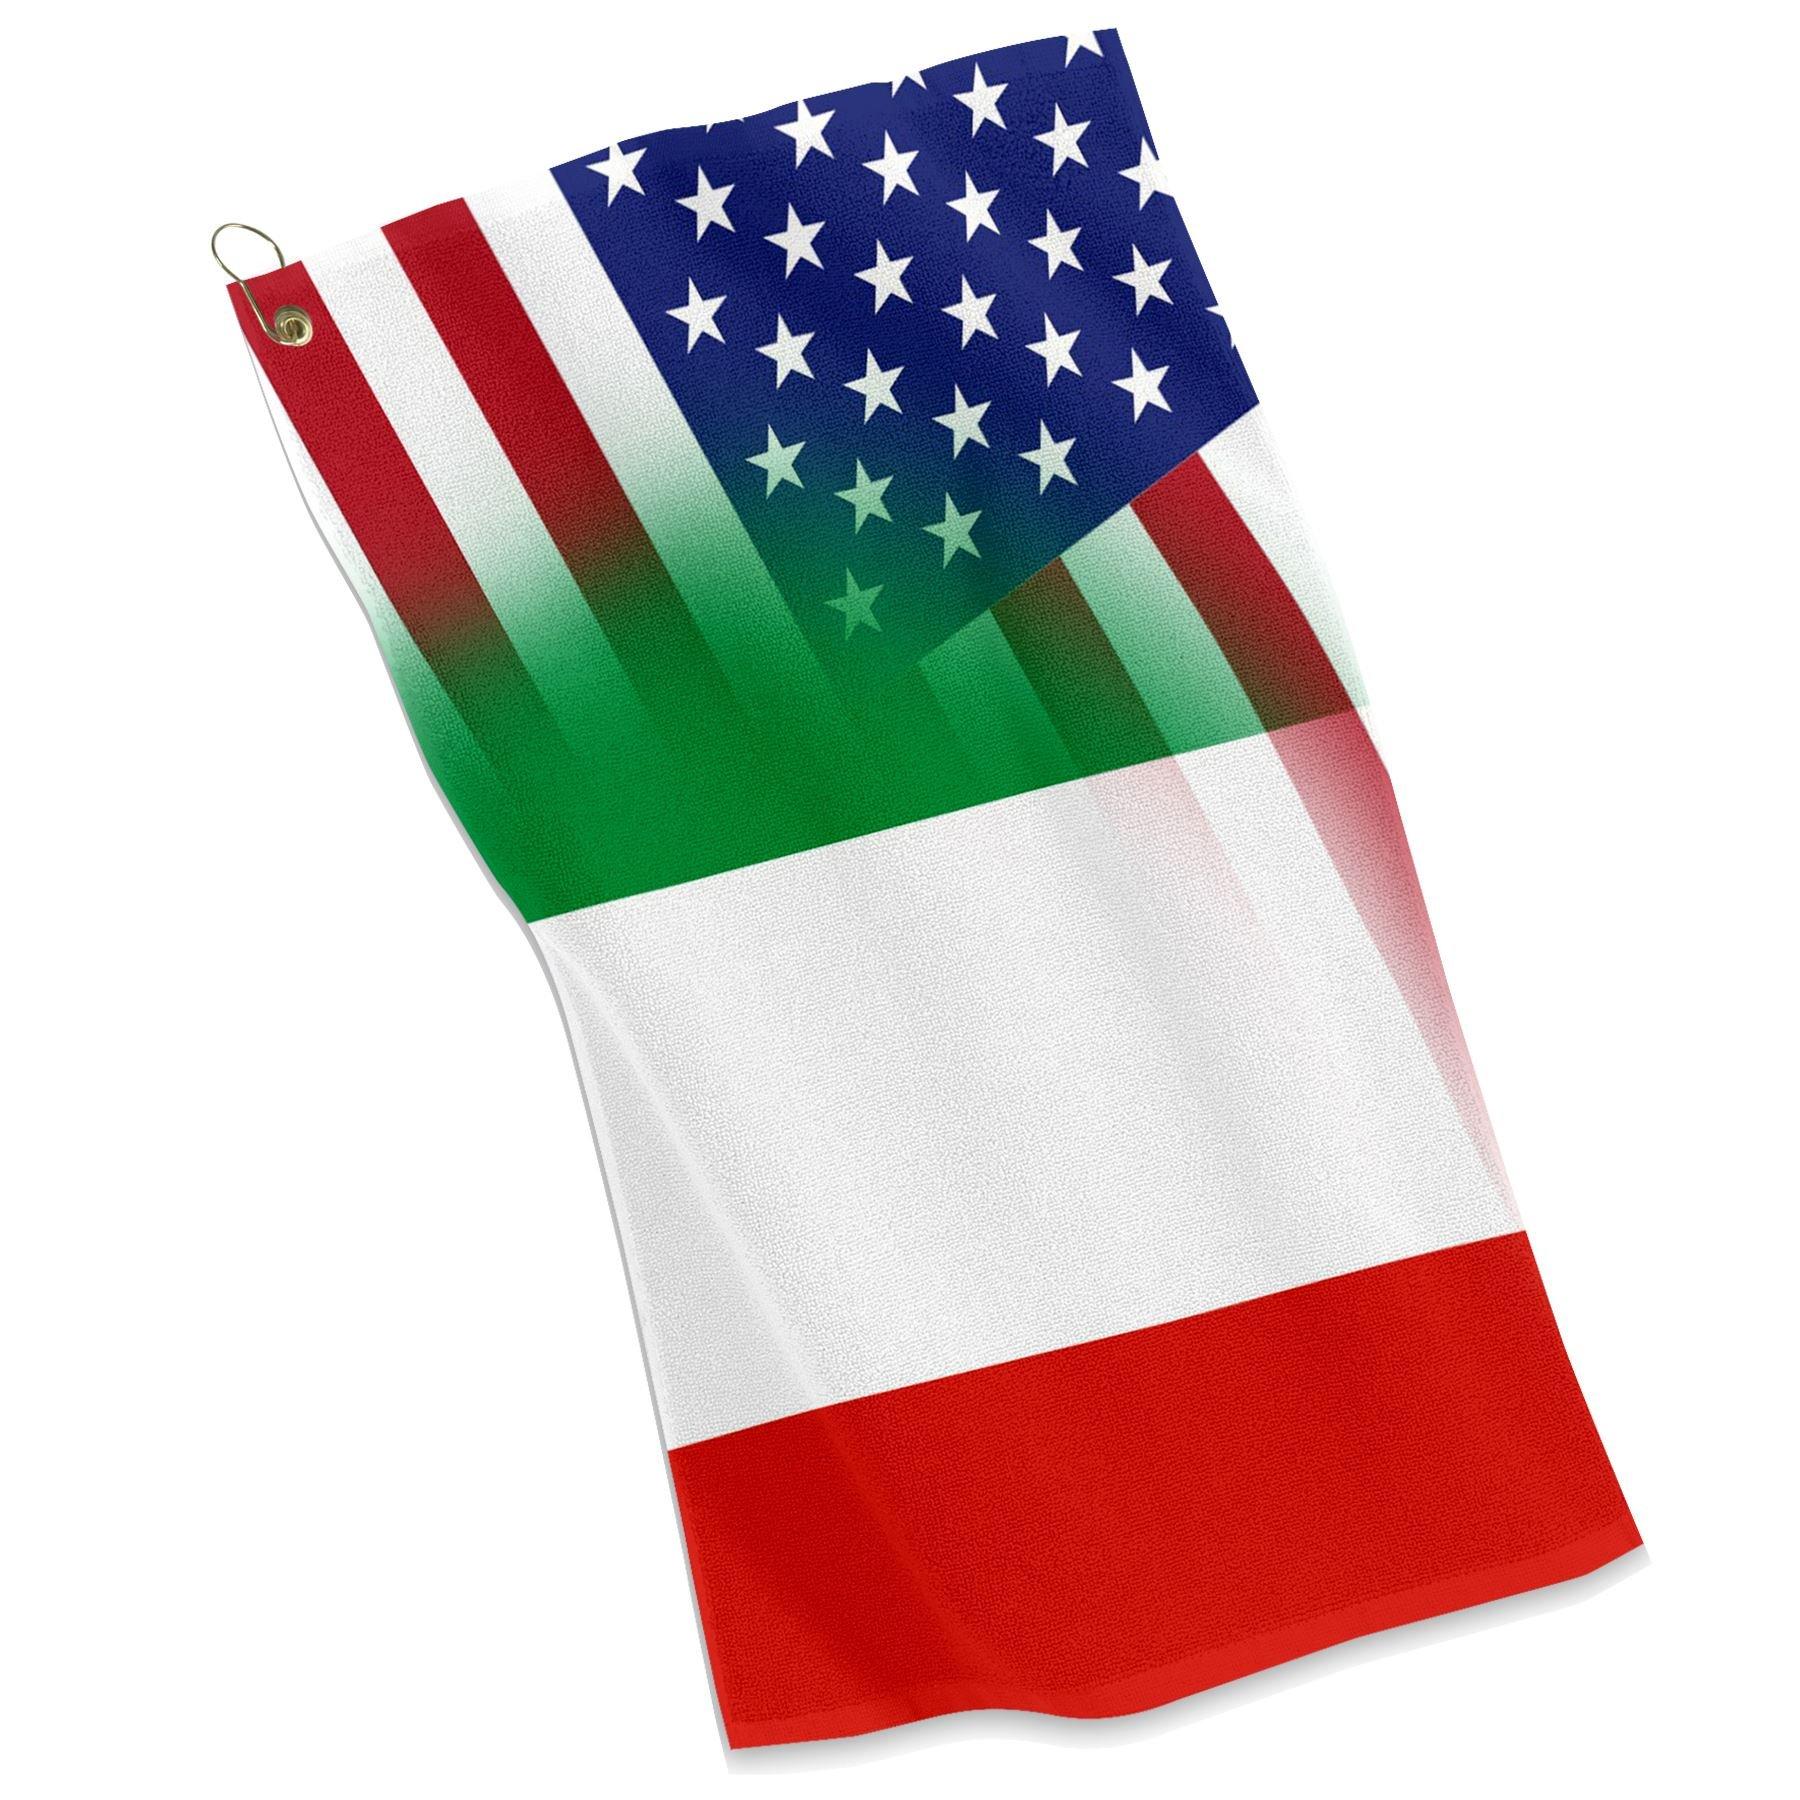 Golf / Sports Towel - Flag of Italy & USA - Italian, Italia